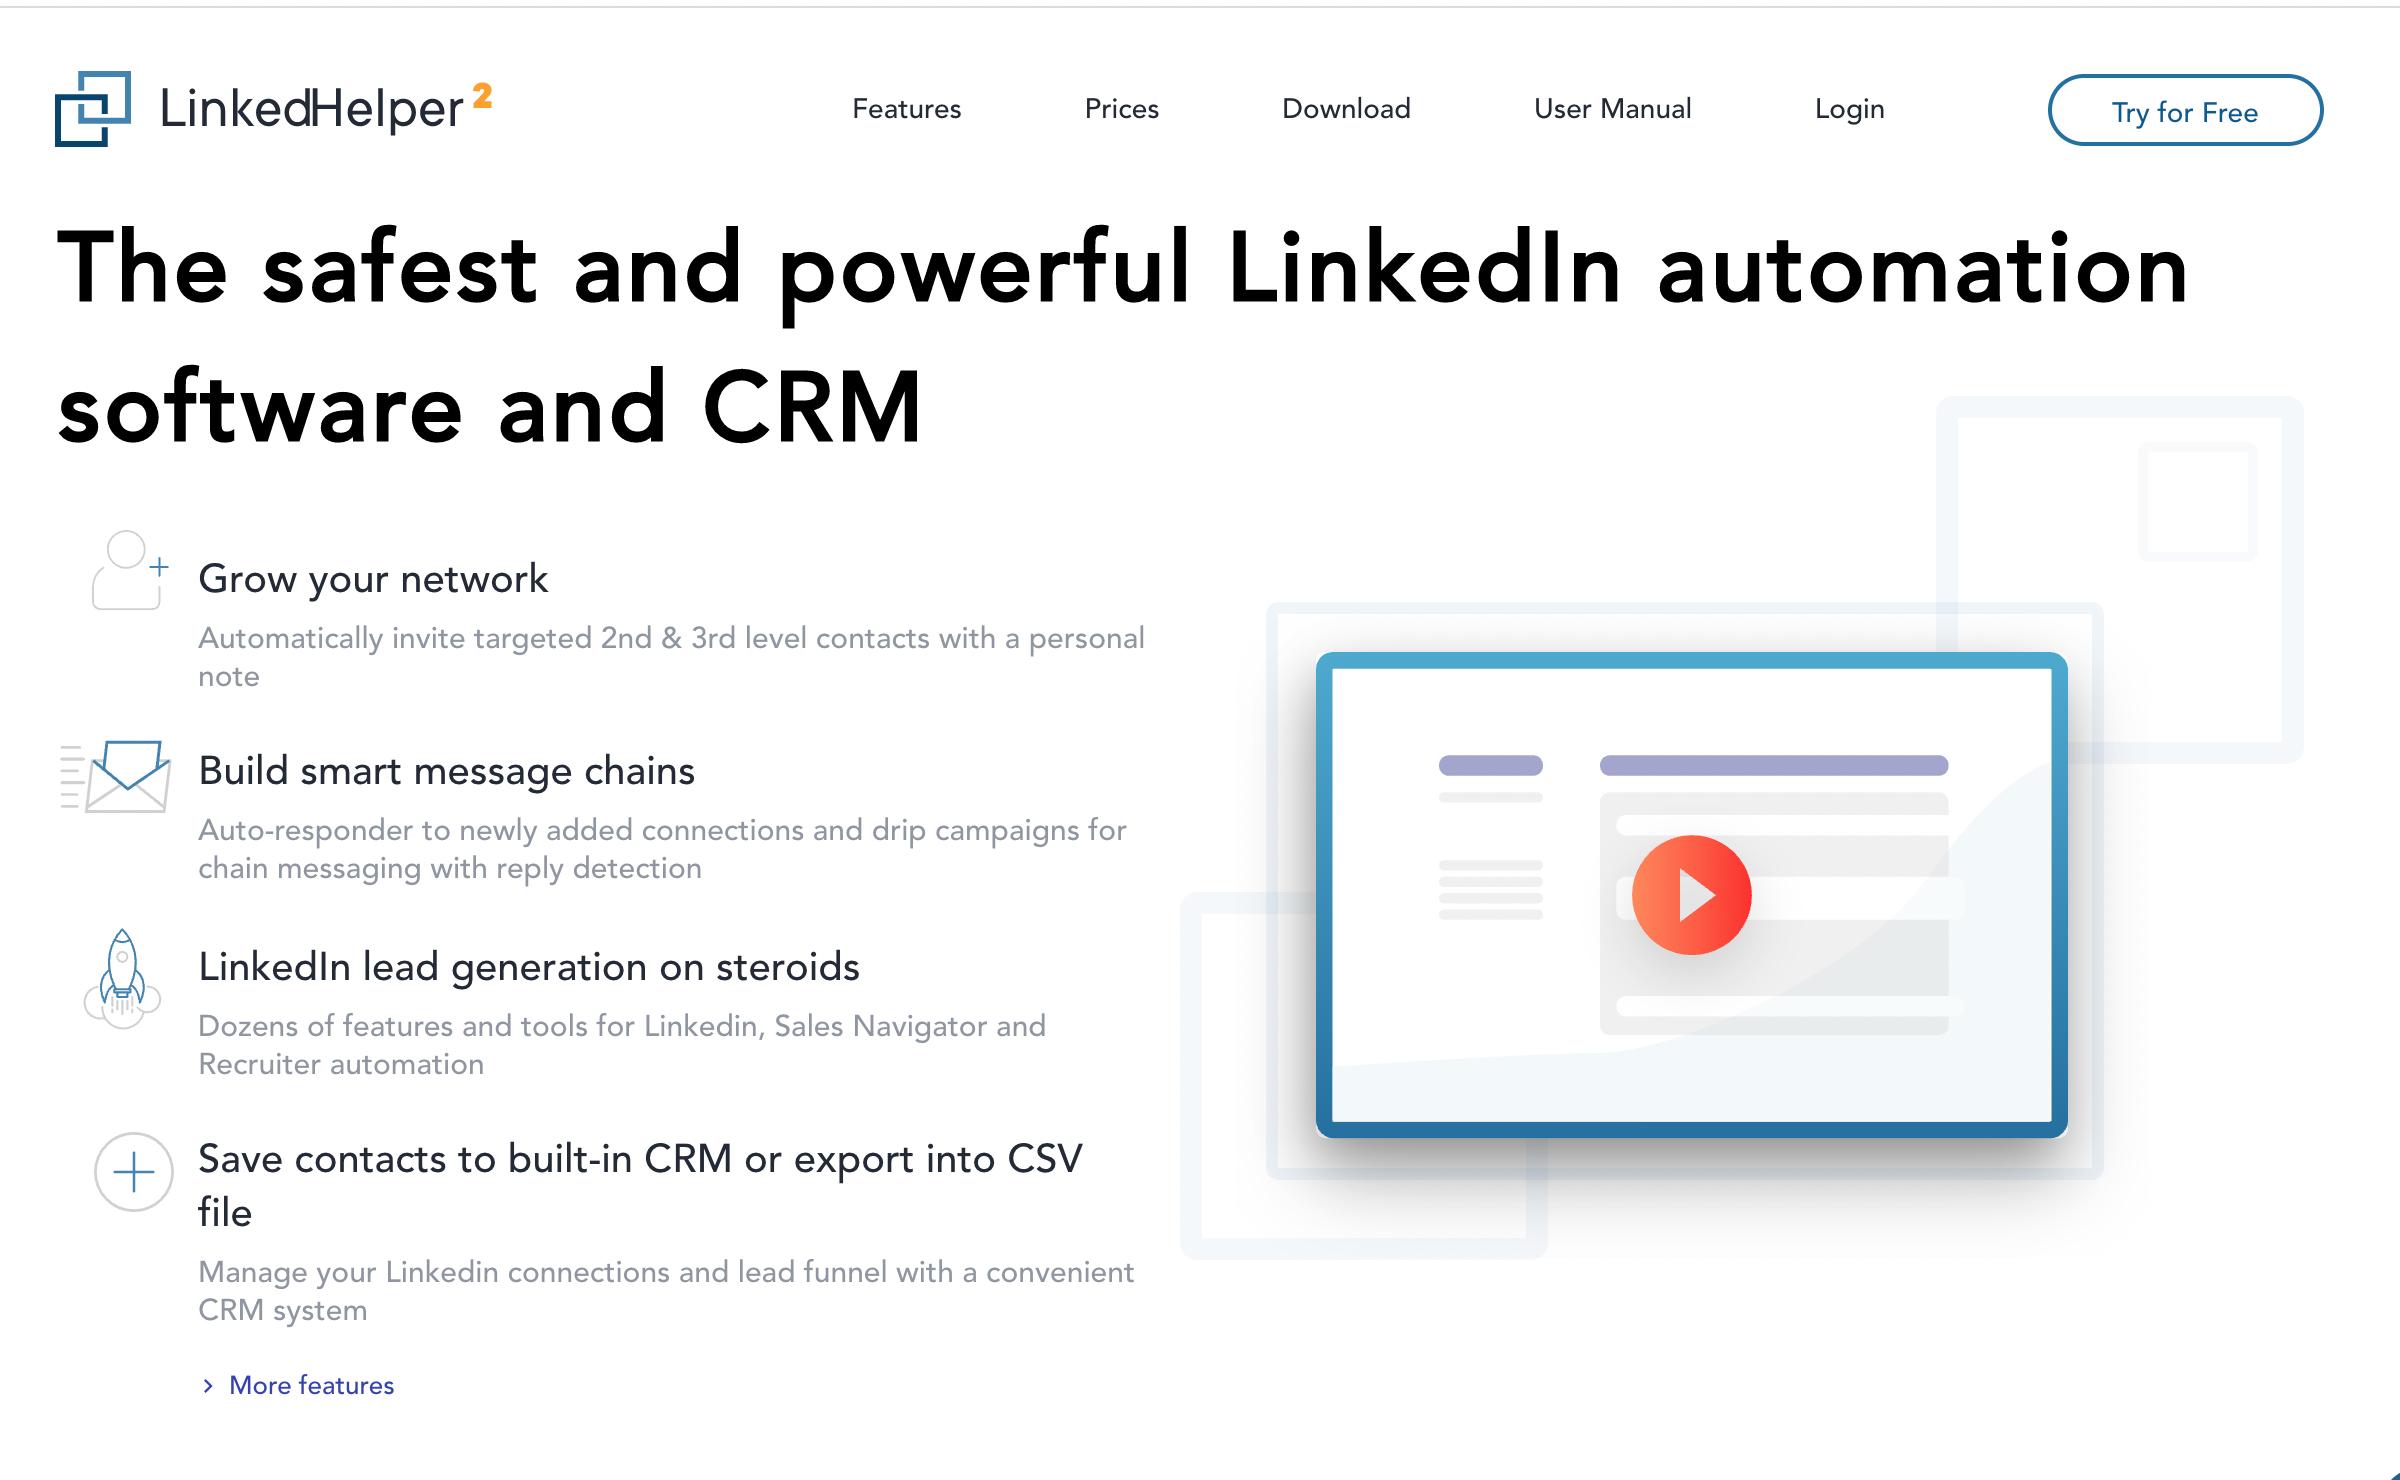 linkedin-helper-homepage.jpg